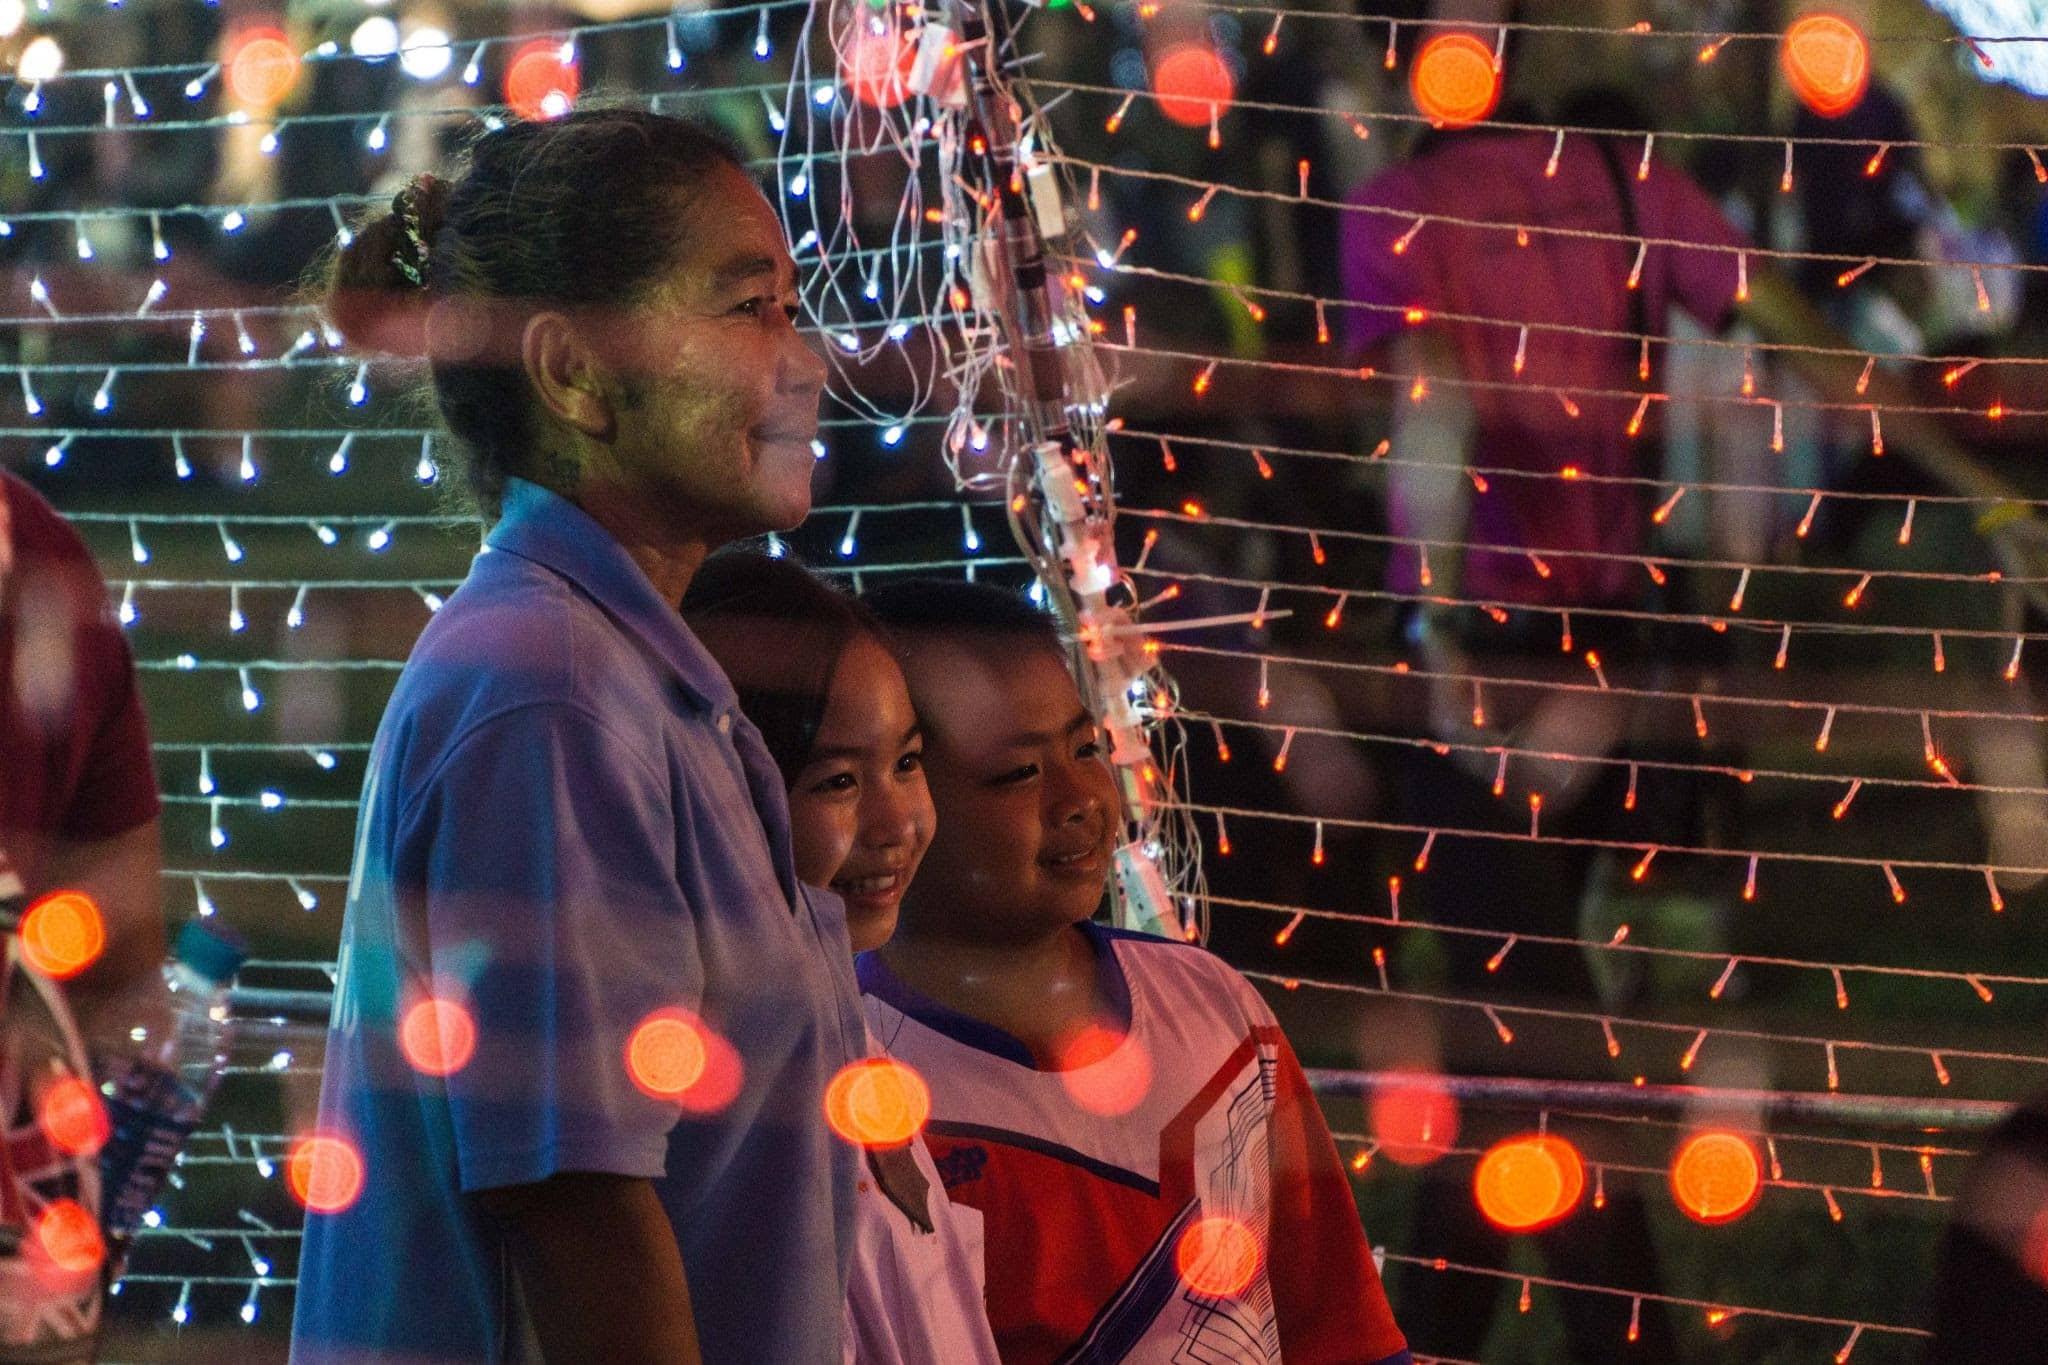 Thailand New Year (Songkran)